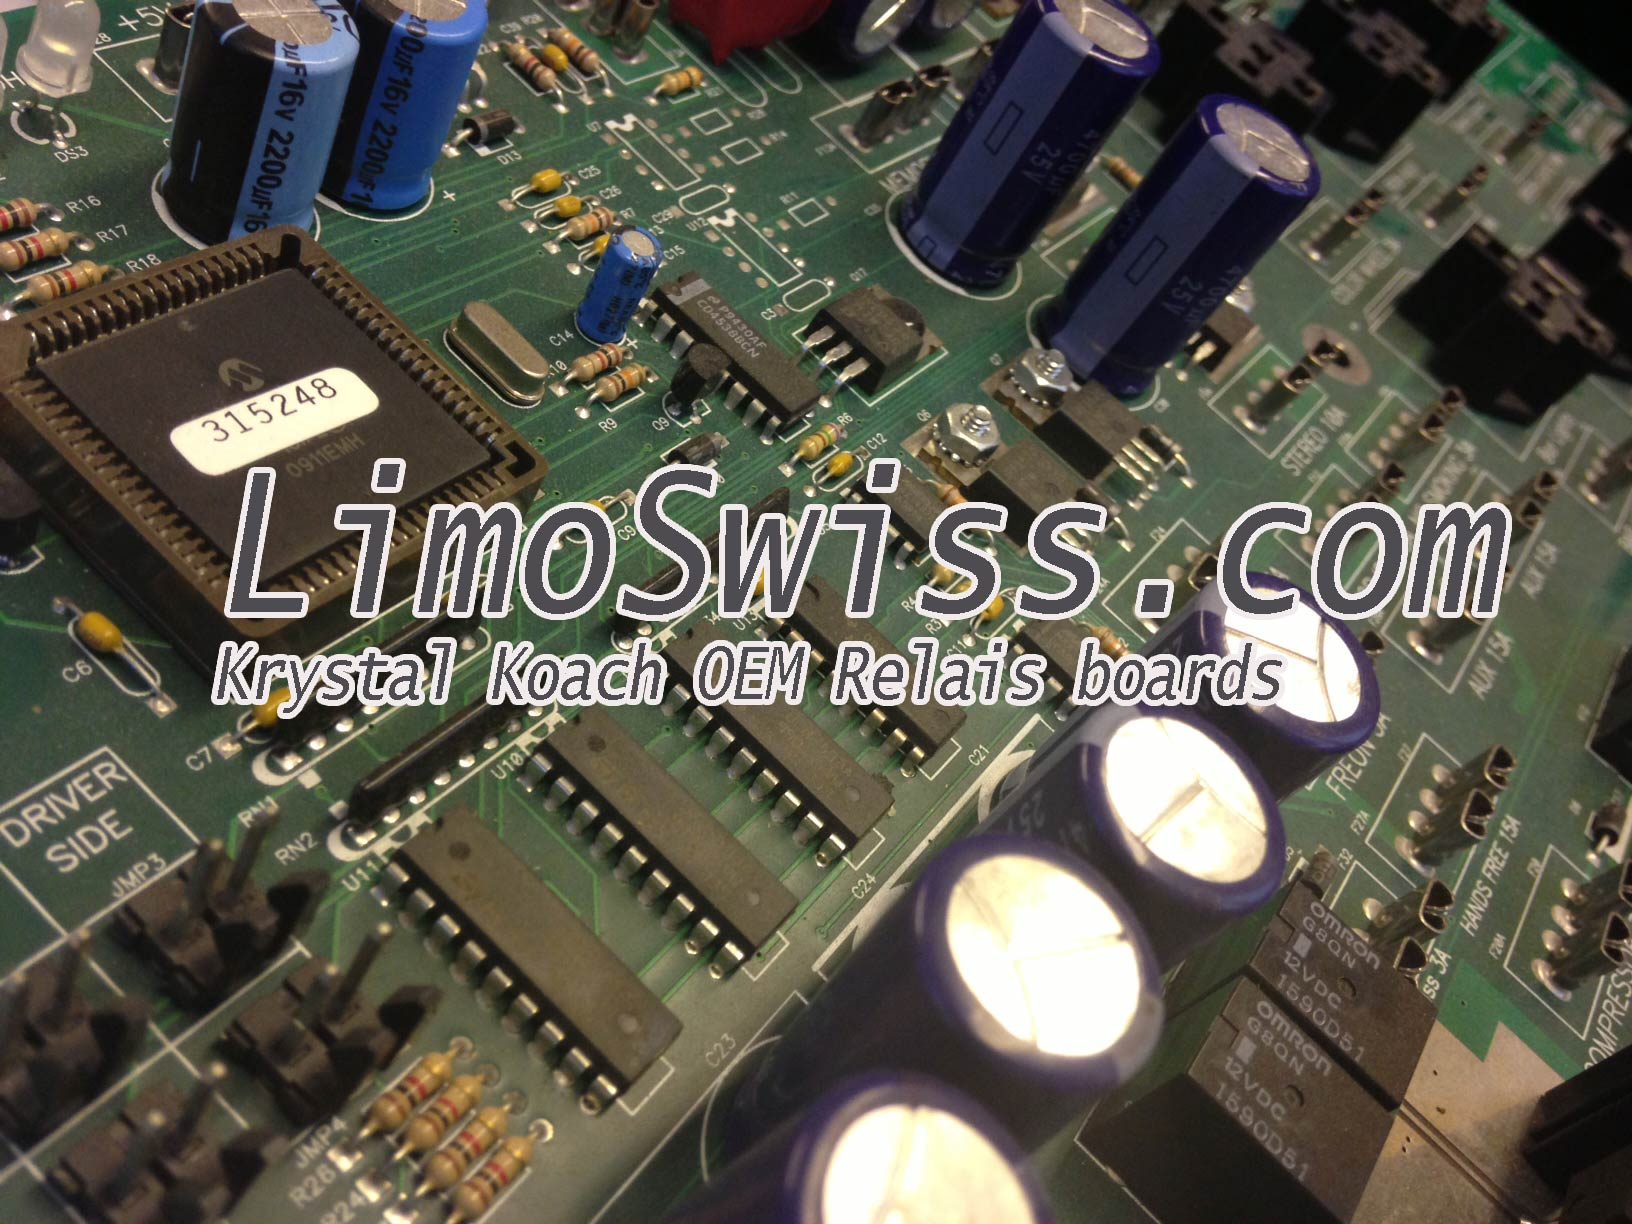 western elegante golf cart wiring diagram 700r4 speed sensor lincoln limo heater core